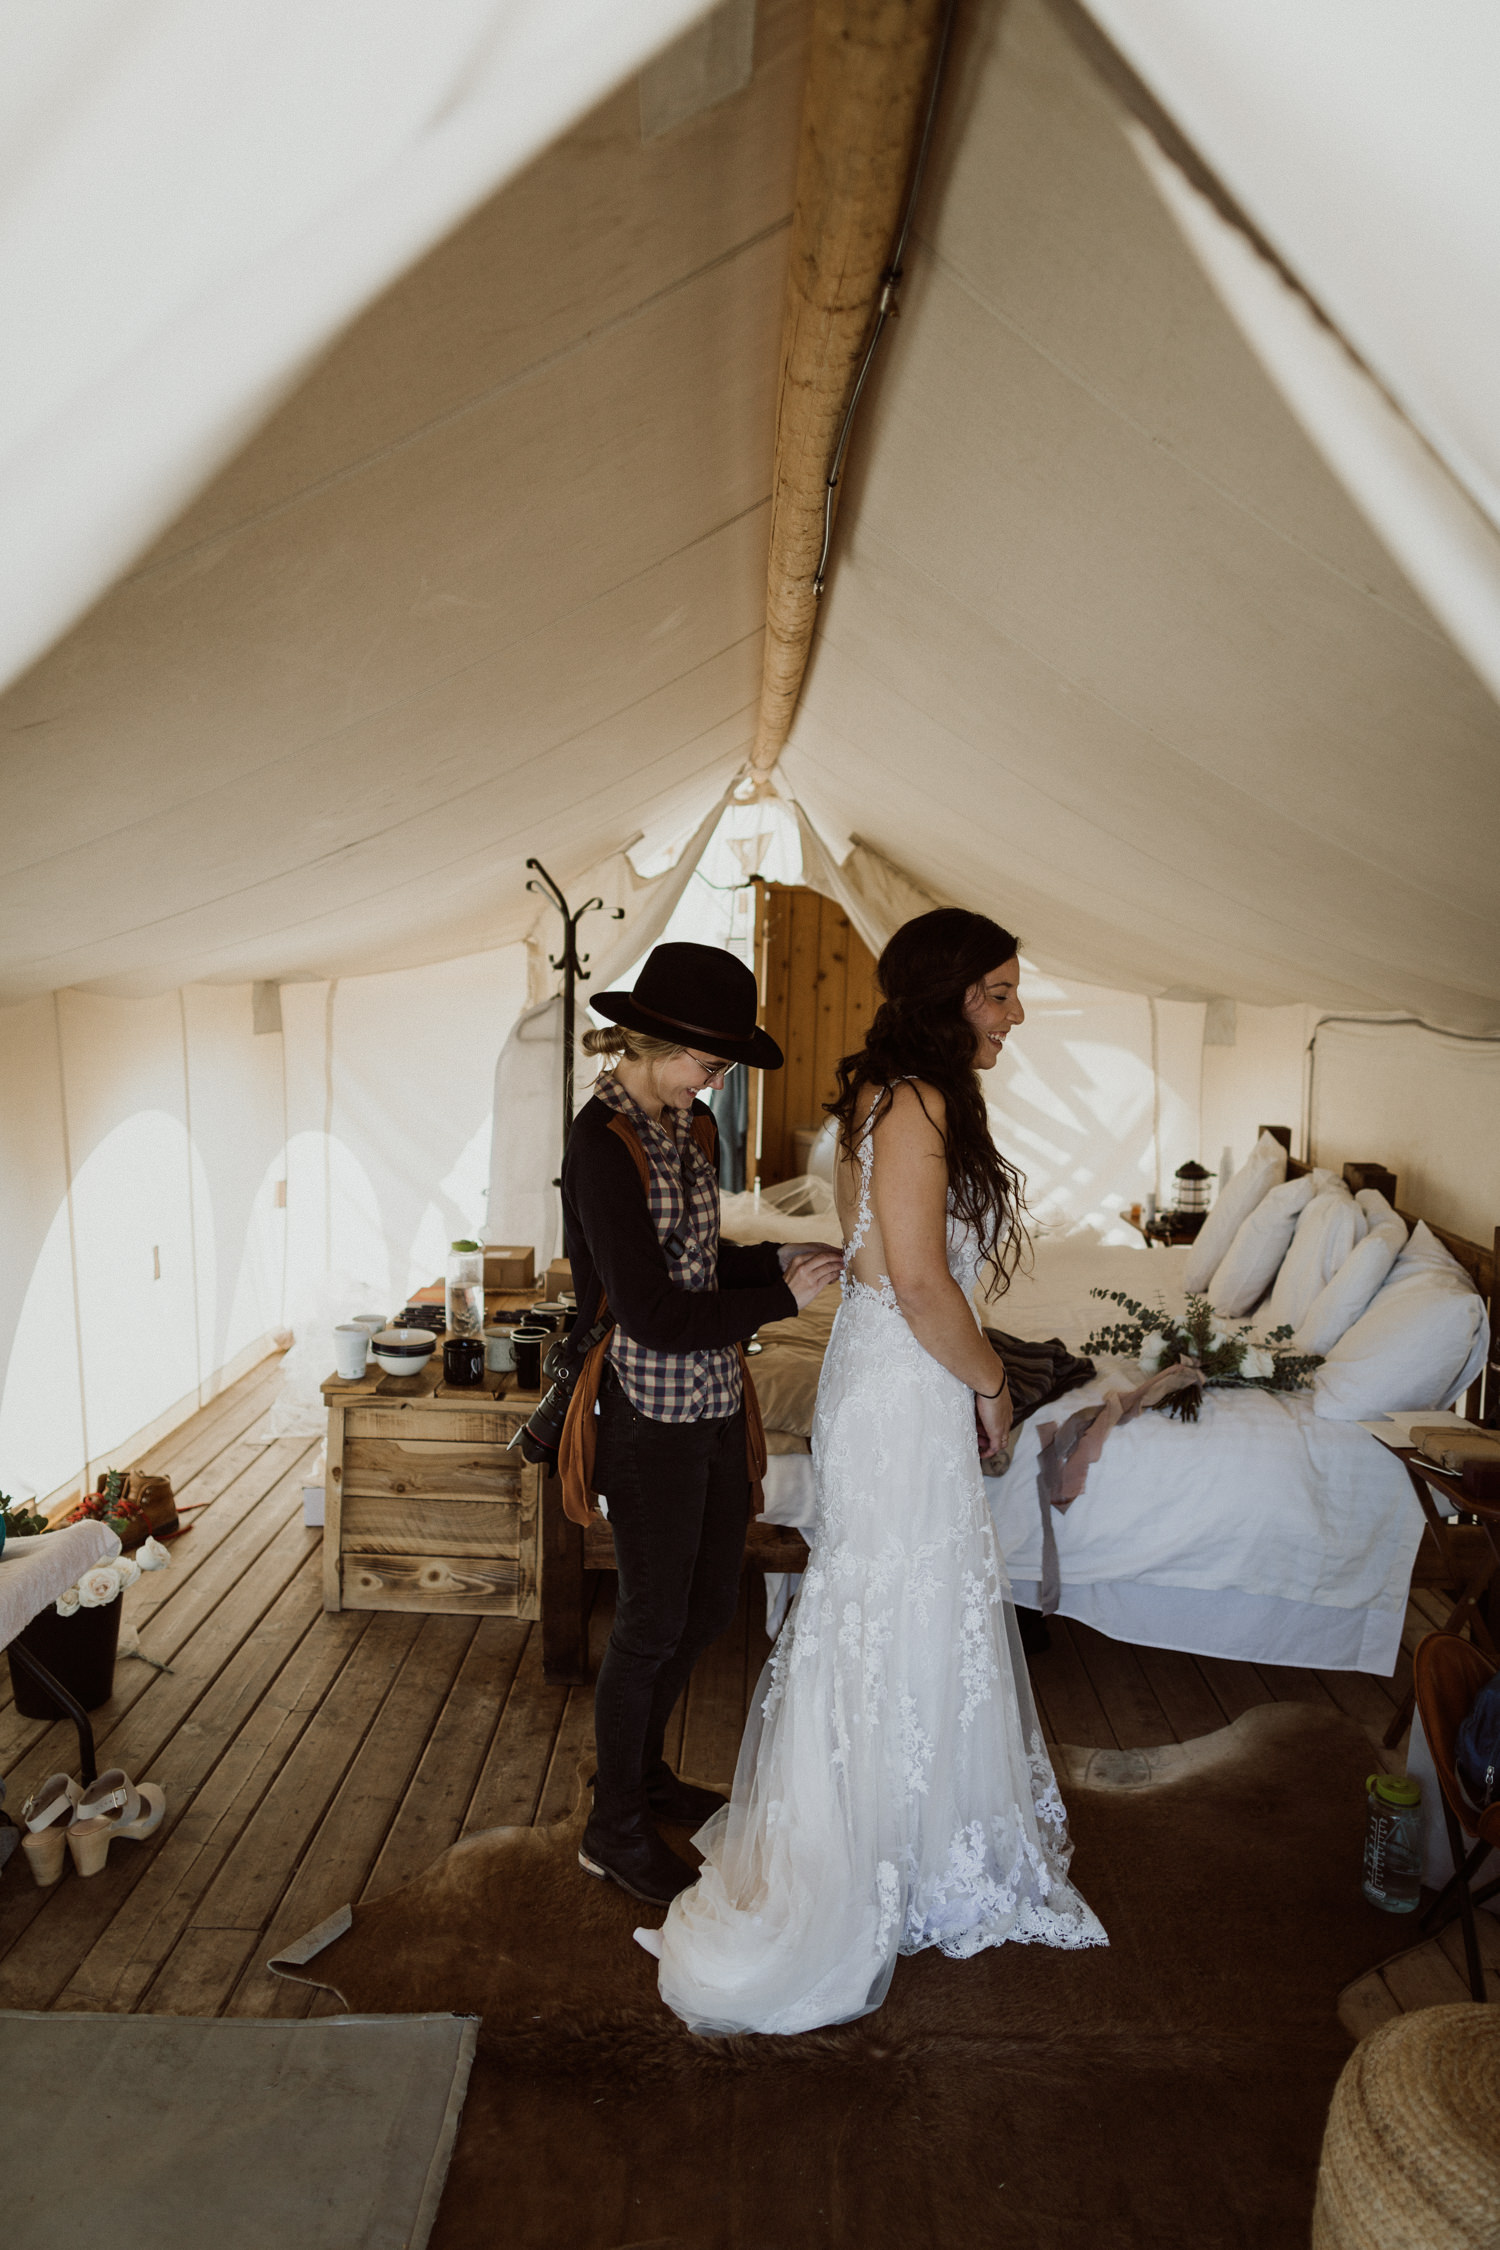 17_moab-utah-elopement-photographer-29.jpg